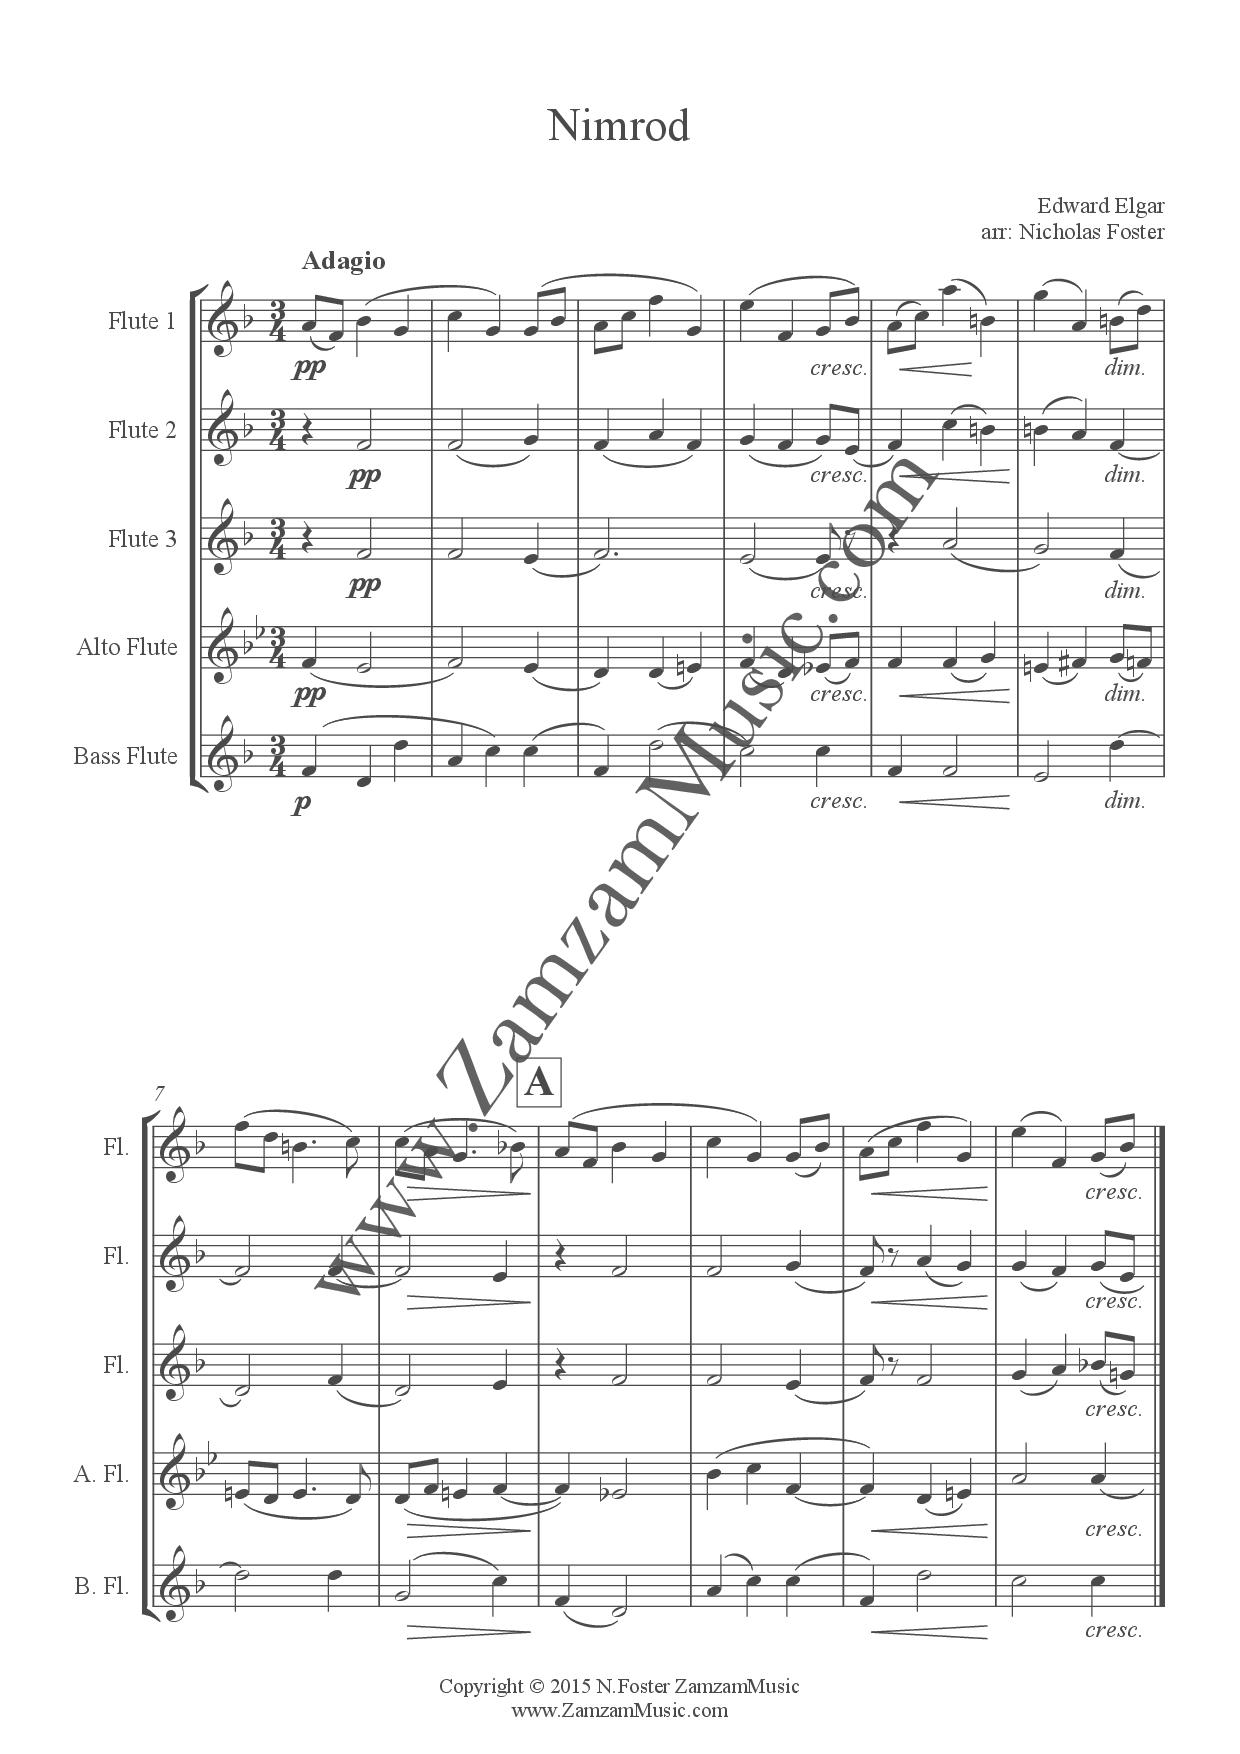 Elgar, Edward  - Nimrod from Enigma Variations  3 flutes, Alto, Bass  flutes  - Zamzam Music